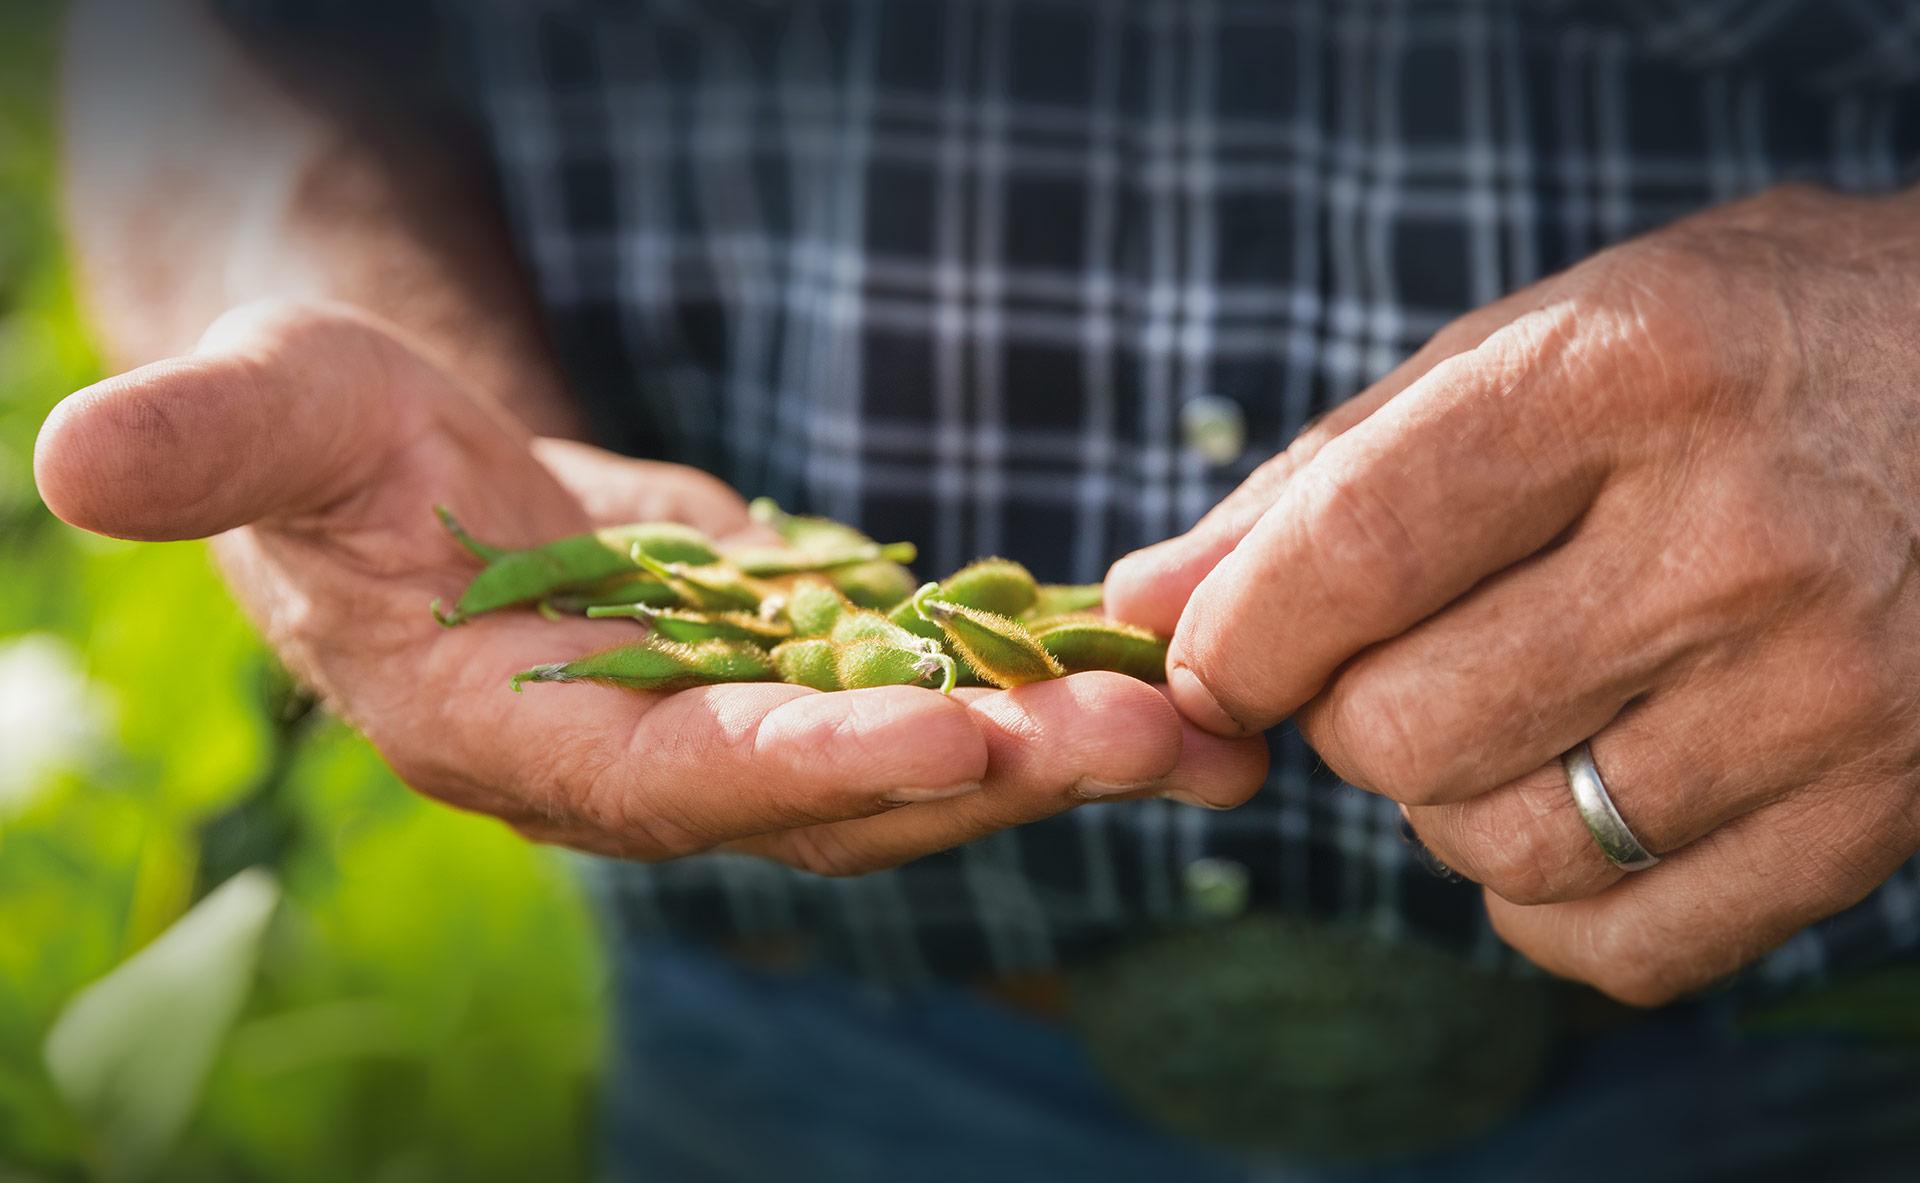 Farmer inspecting seeds